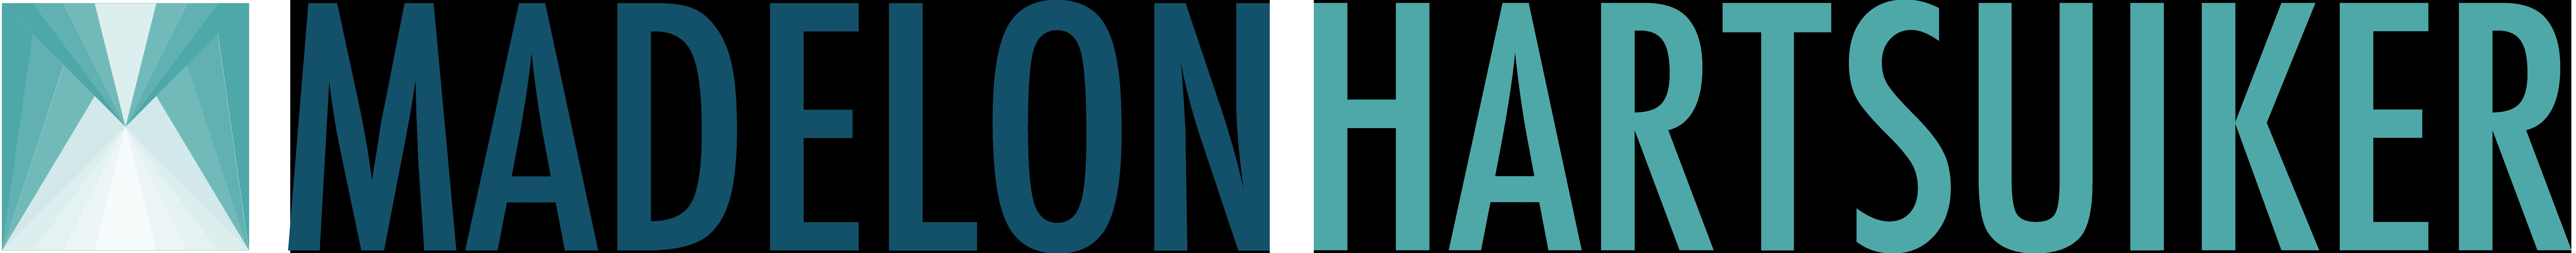 Madelon Hartsuiker logo